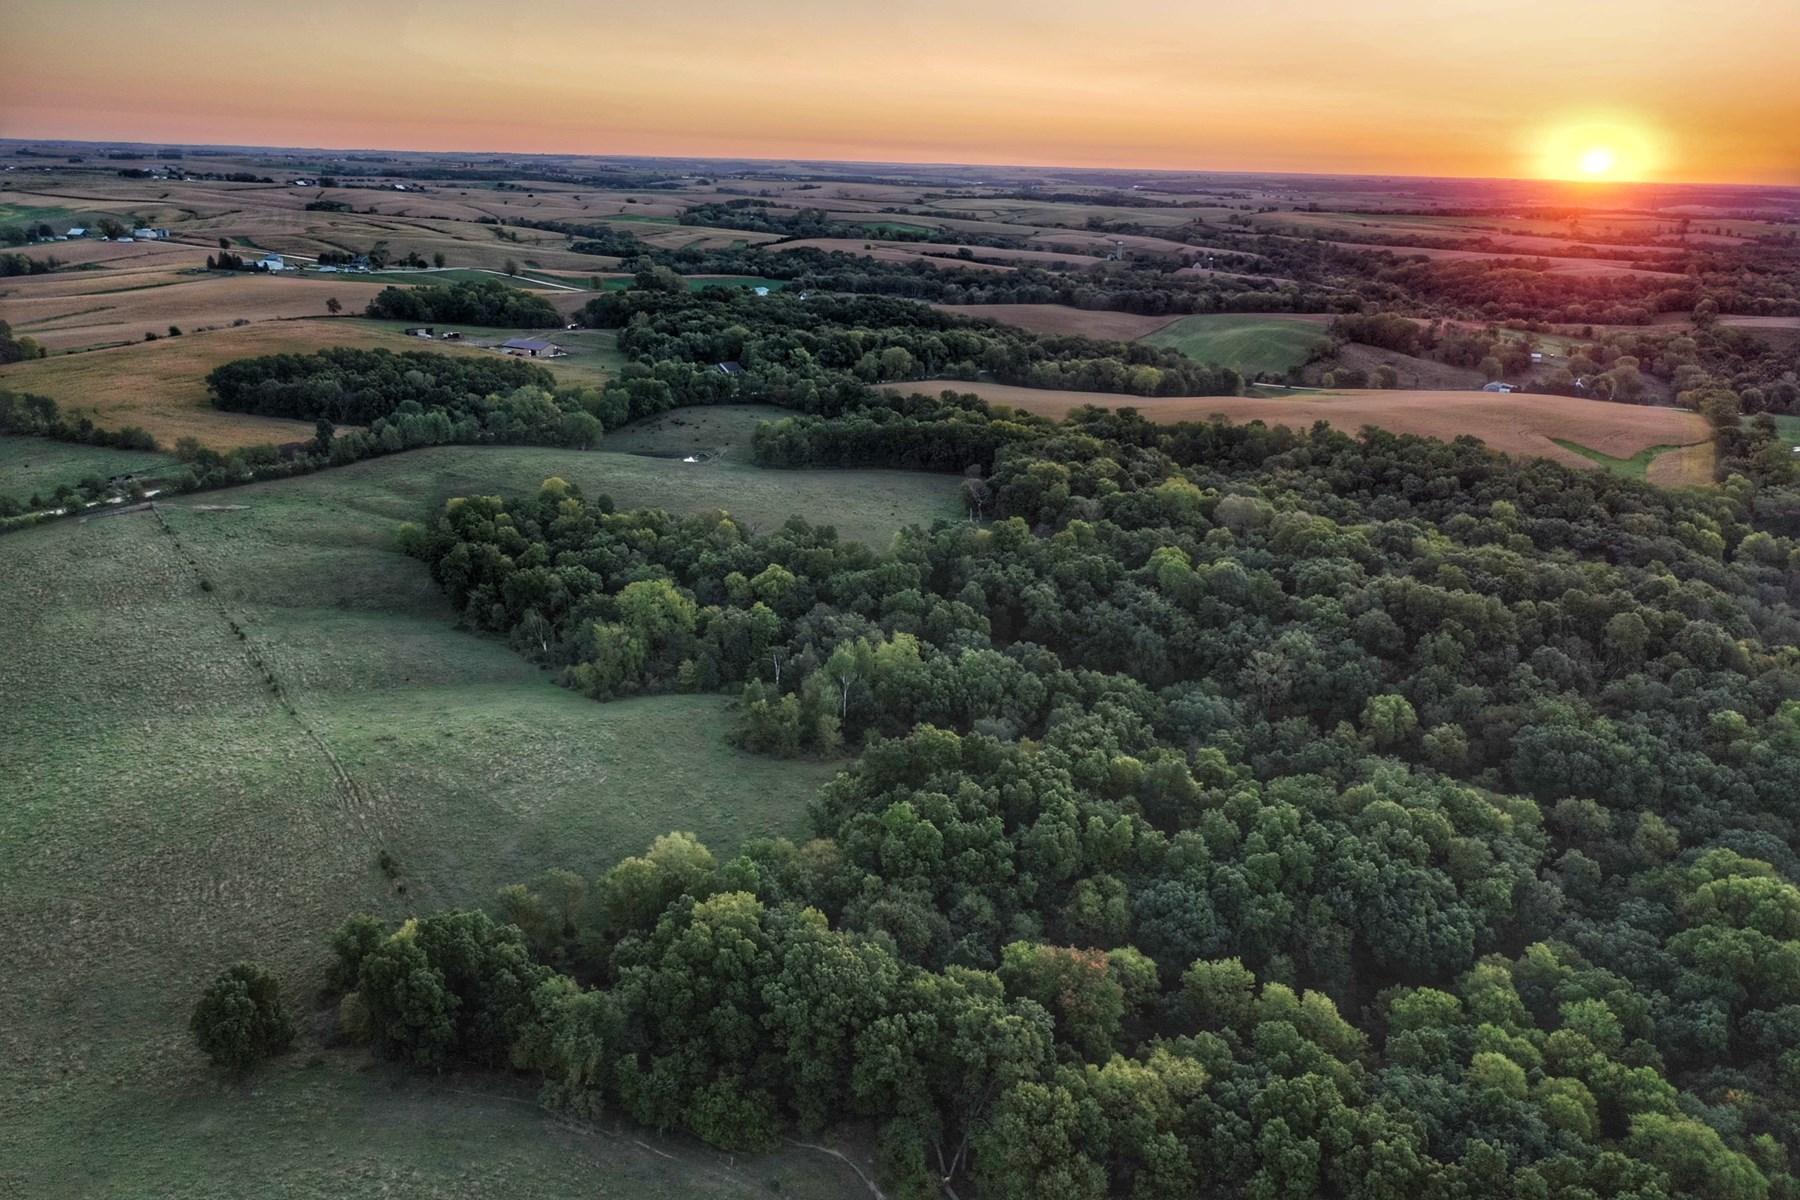 Jackson County, Iowa Hunting & Recreational Land For Sale